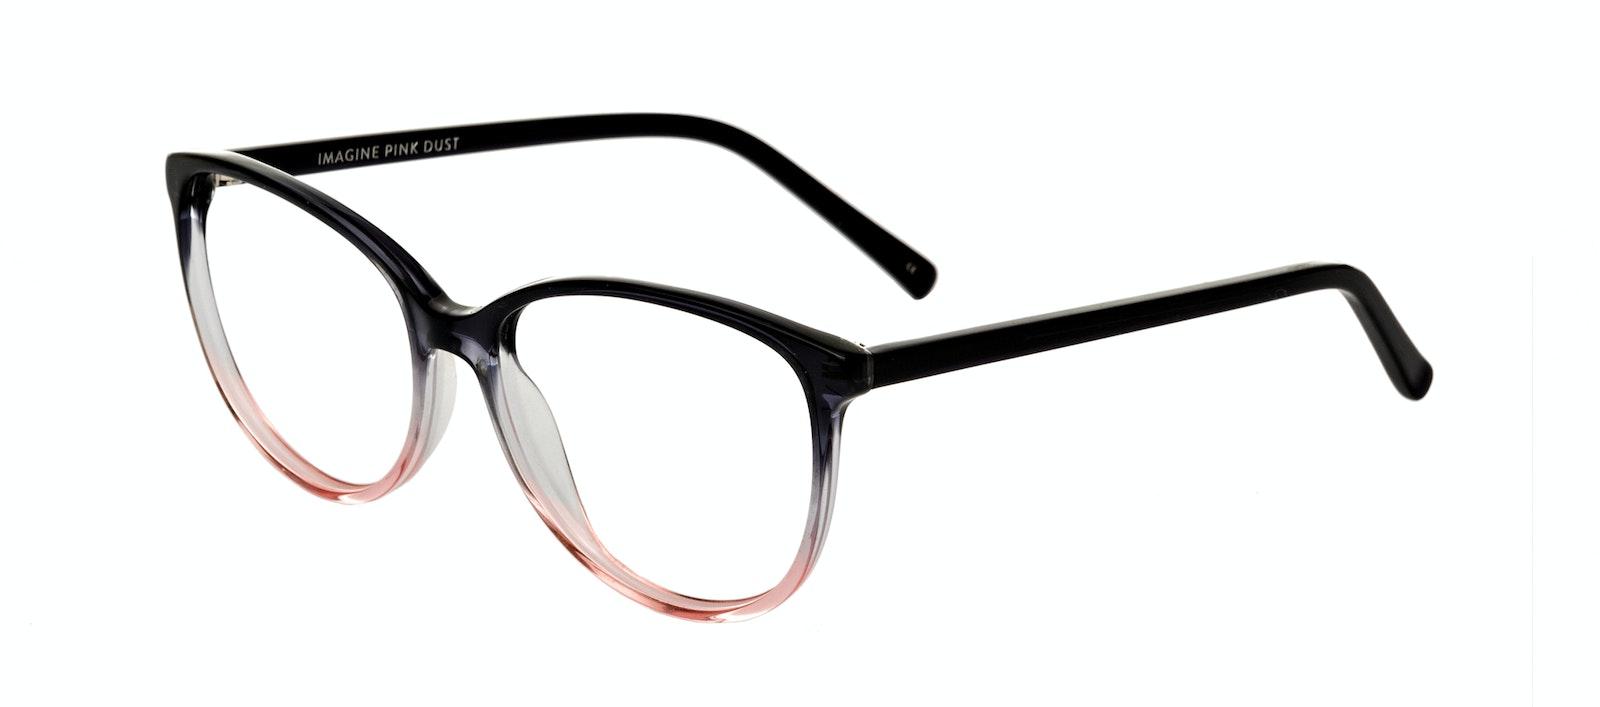 c2efe60e54c Affordable Fashion Glasses Round Eyeglasses Women Imagine Pink Dust Tilt